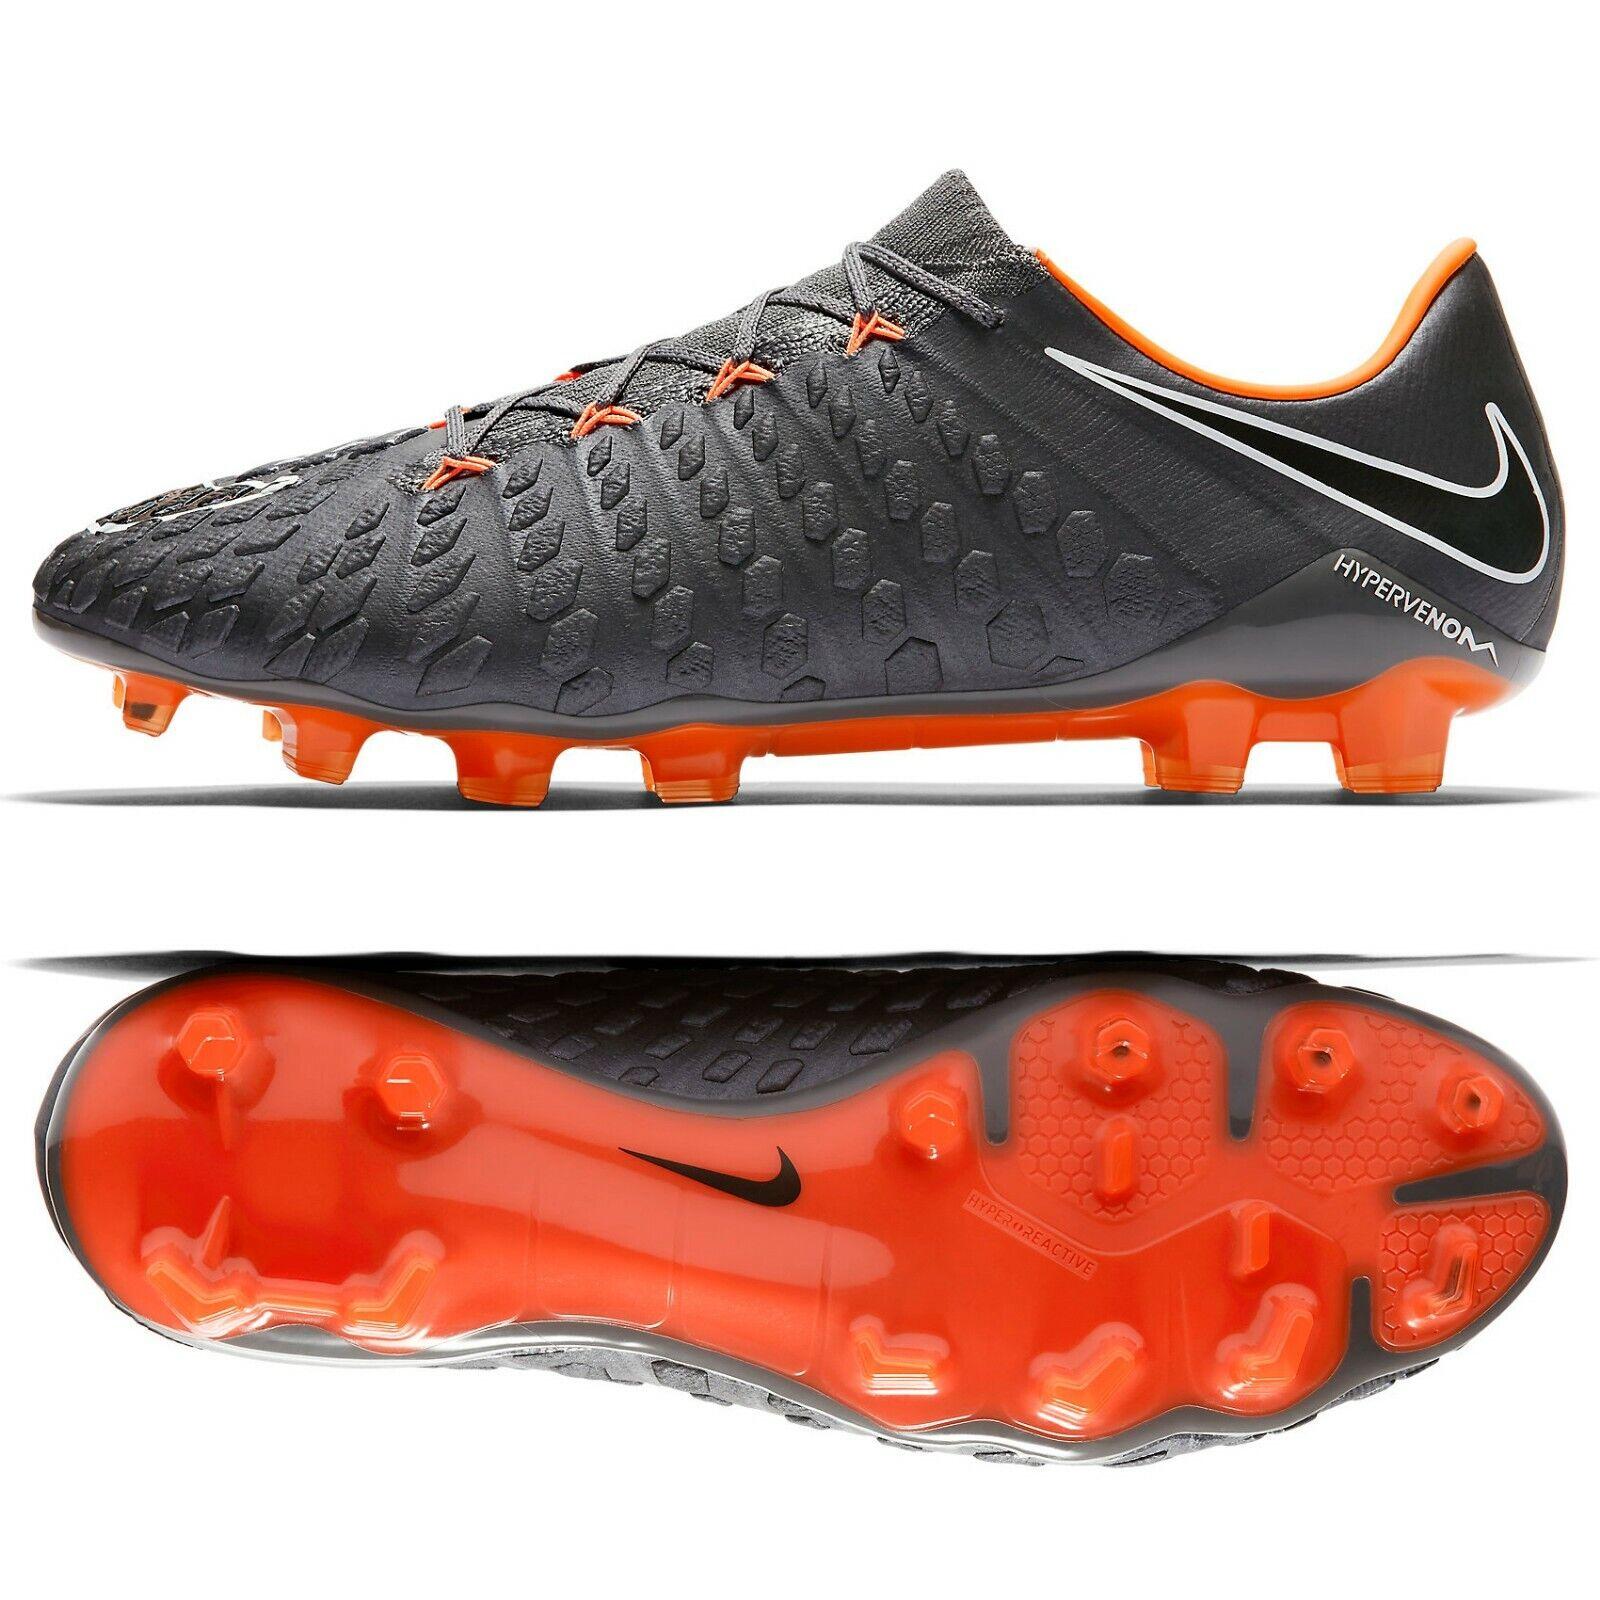 Nike Hypervenom Fantasma III Elite Fg AH7273-081 gris Naranja Para Hombre Botines De Fútbol